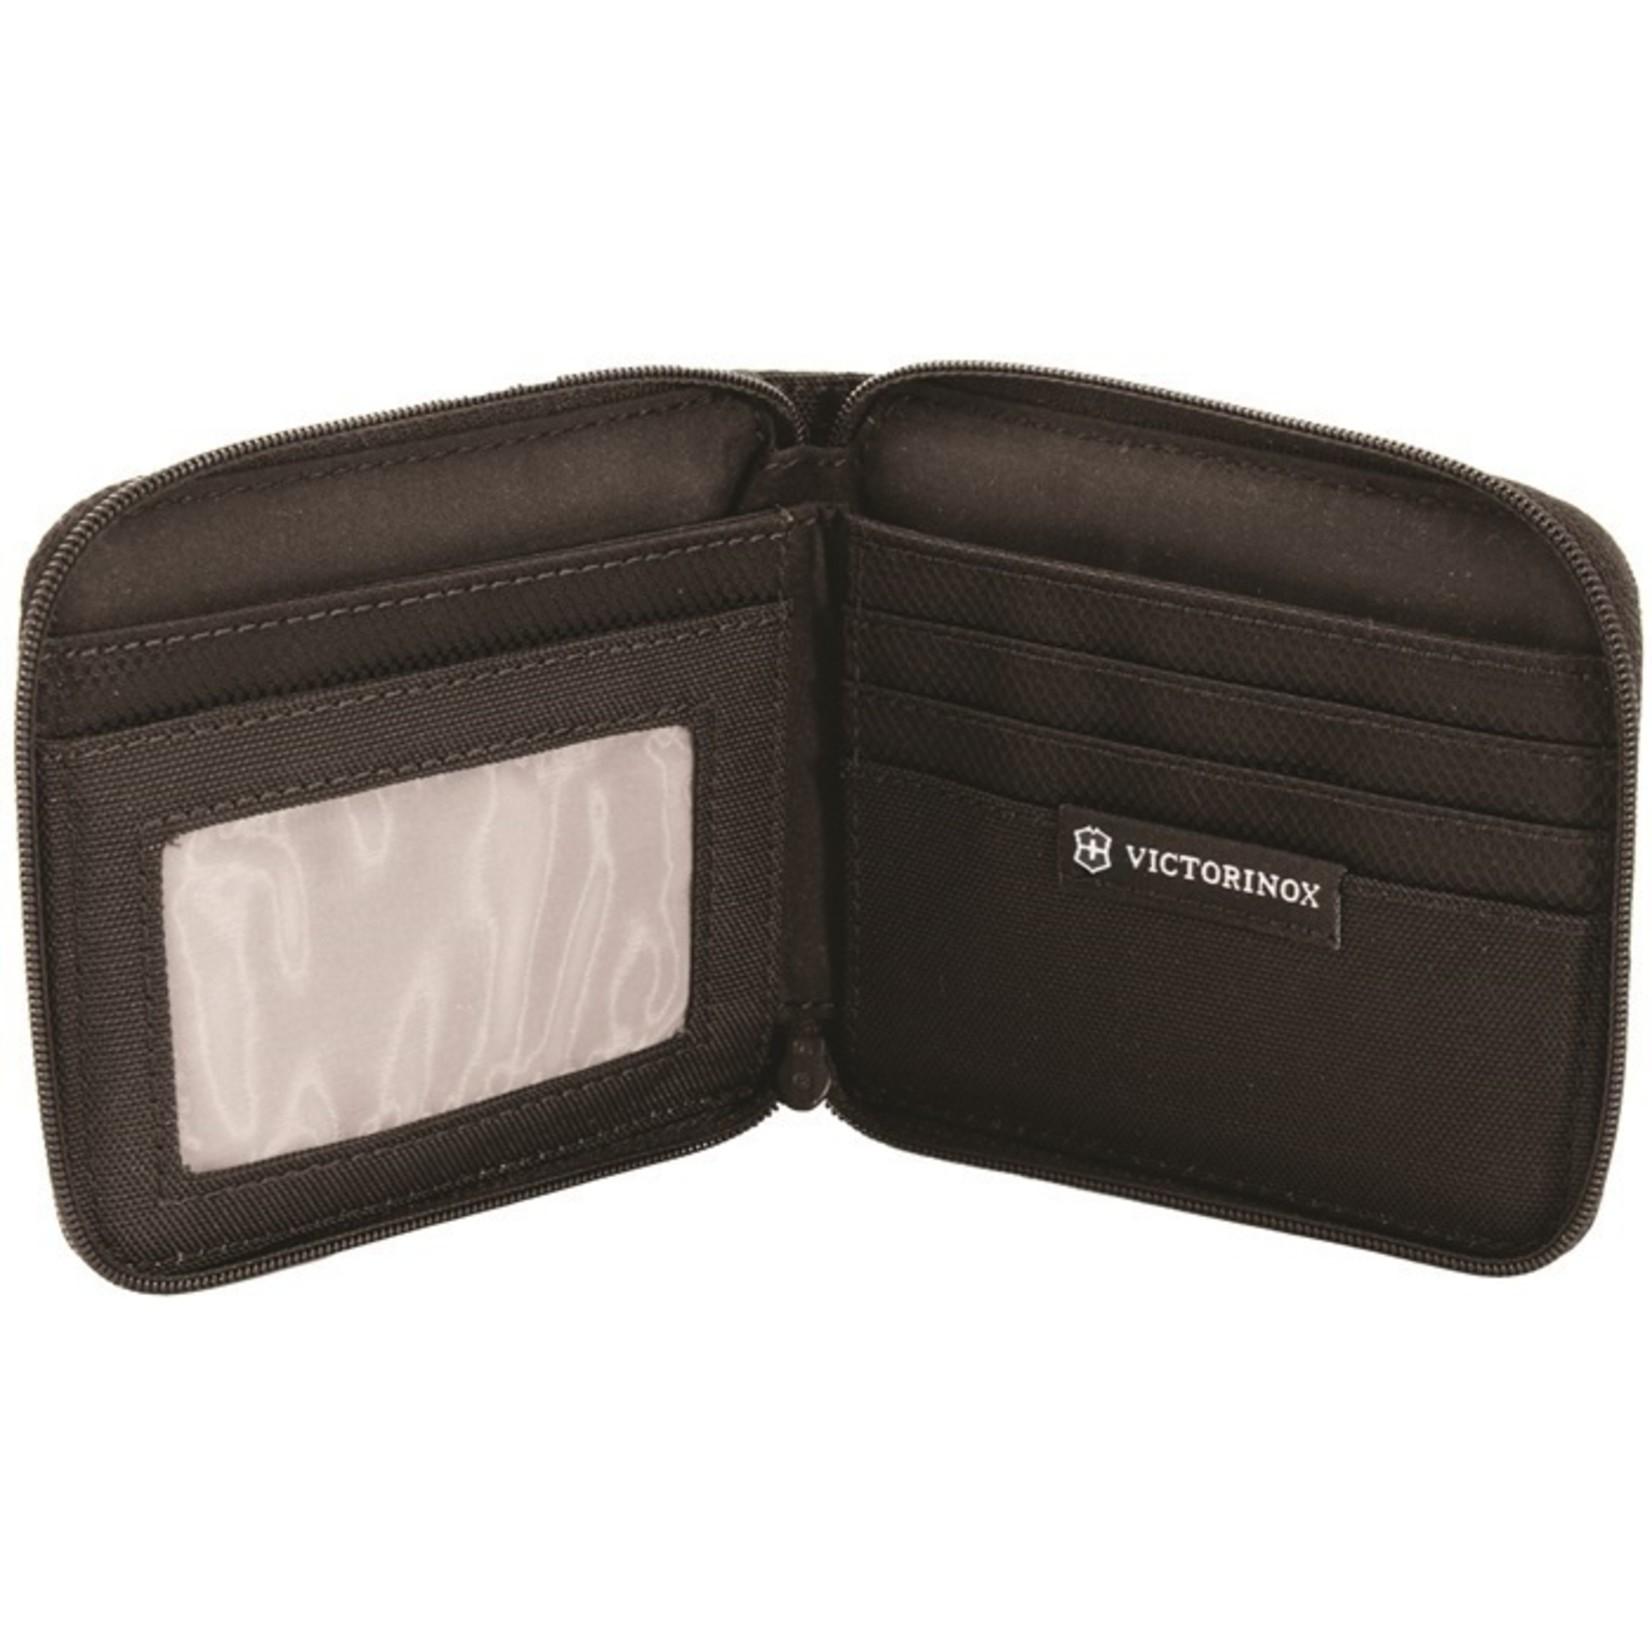 Victorinox Victorinox portemonnee Zip-Around, zwart